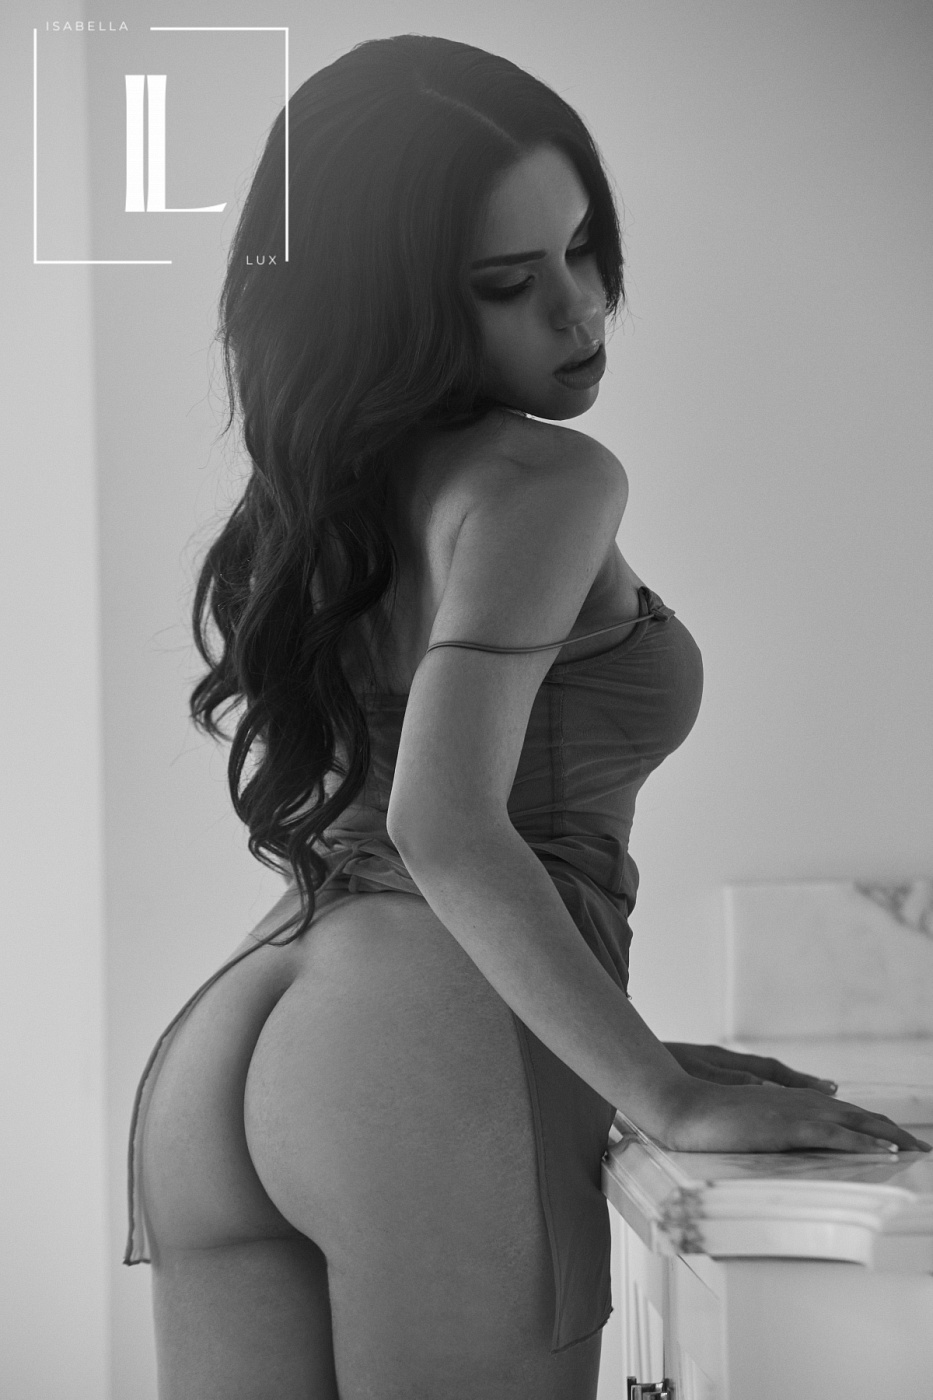 Isabella Lux